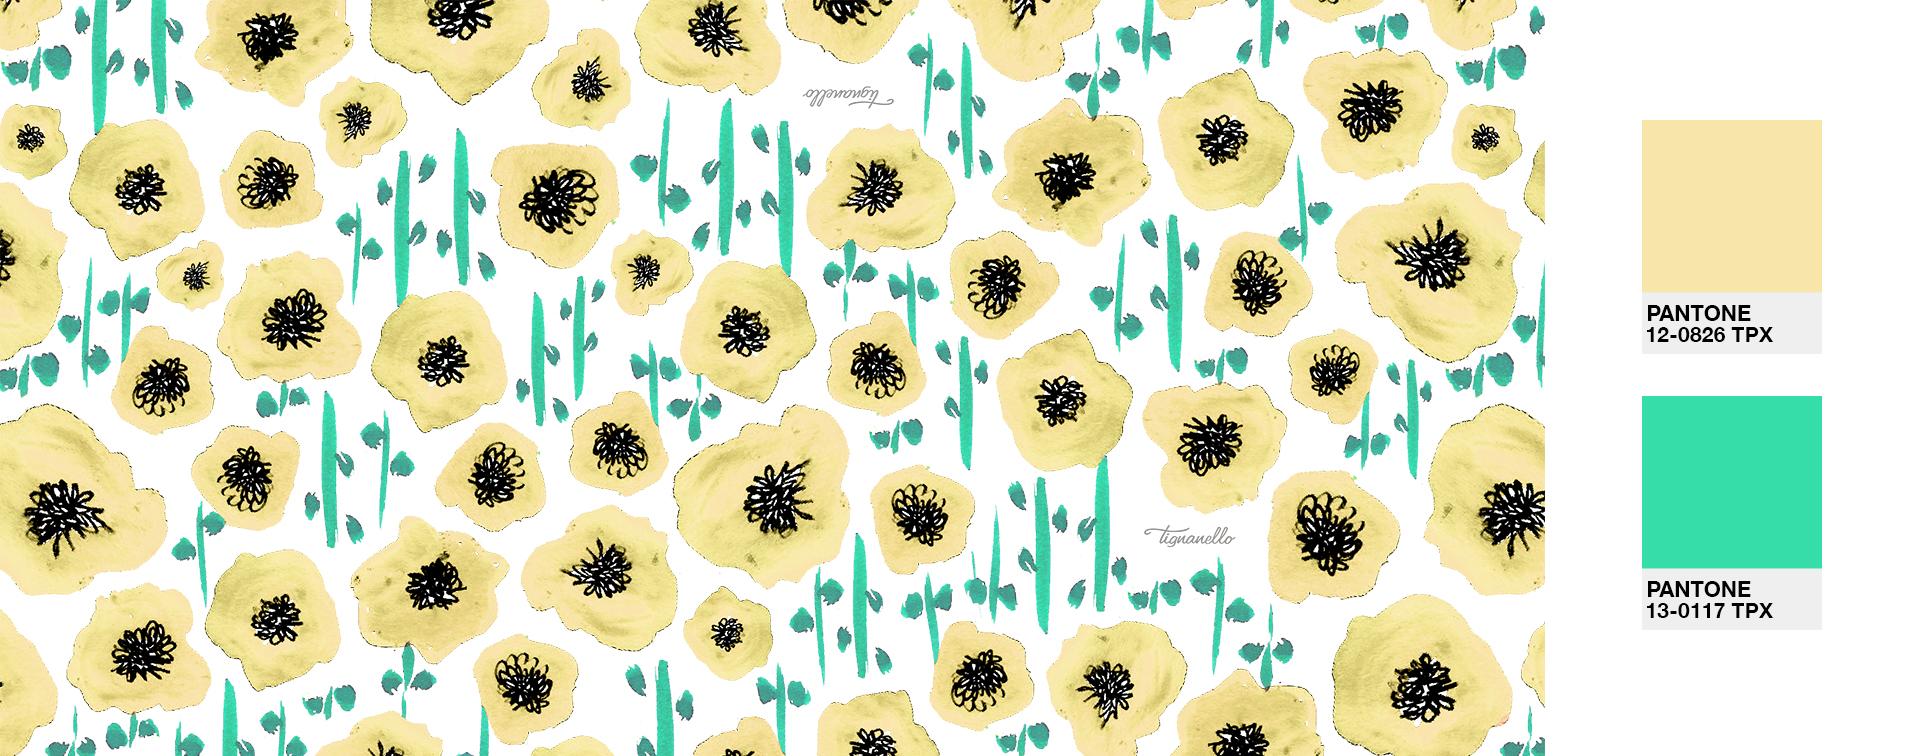 pantone-poppies-canary